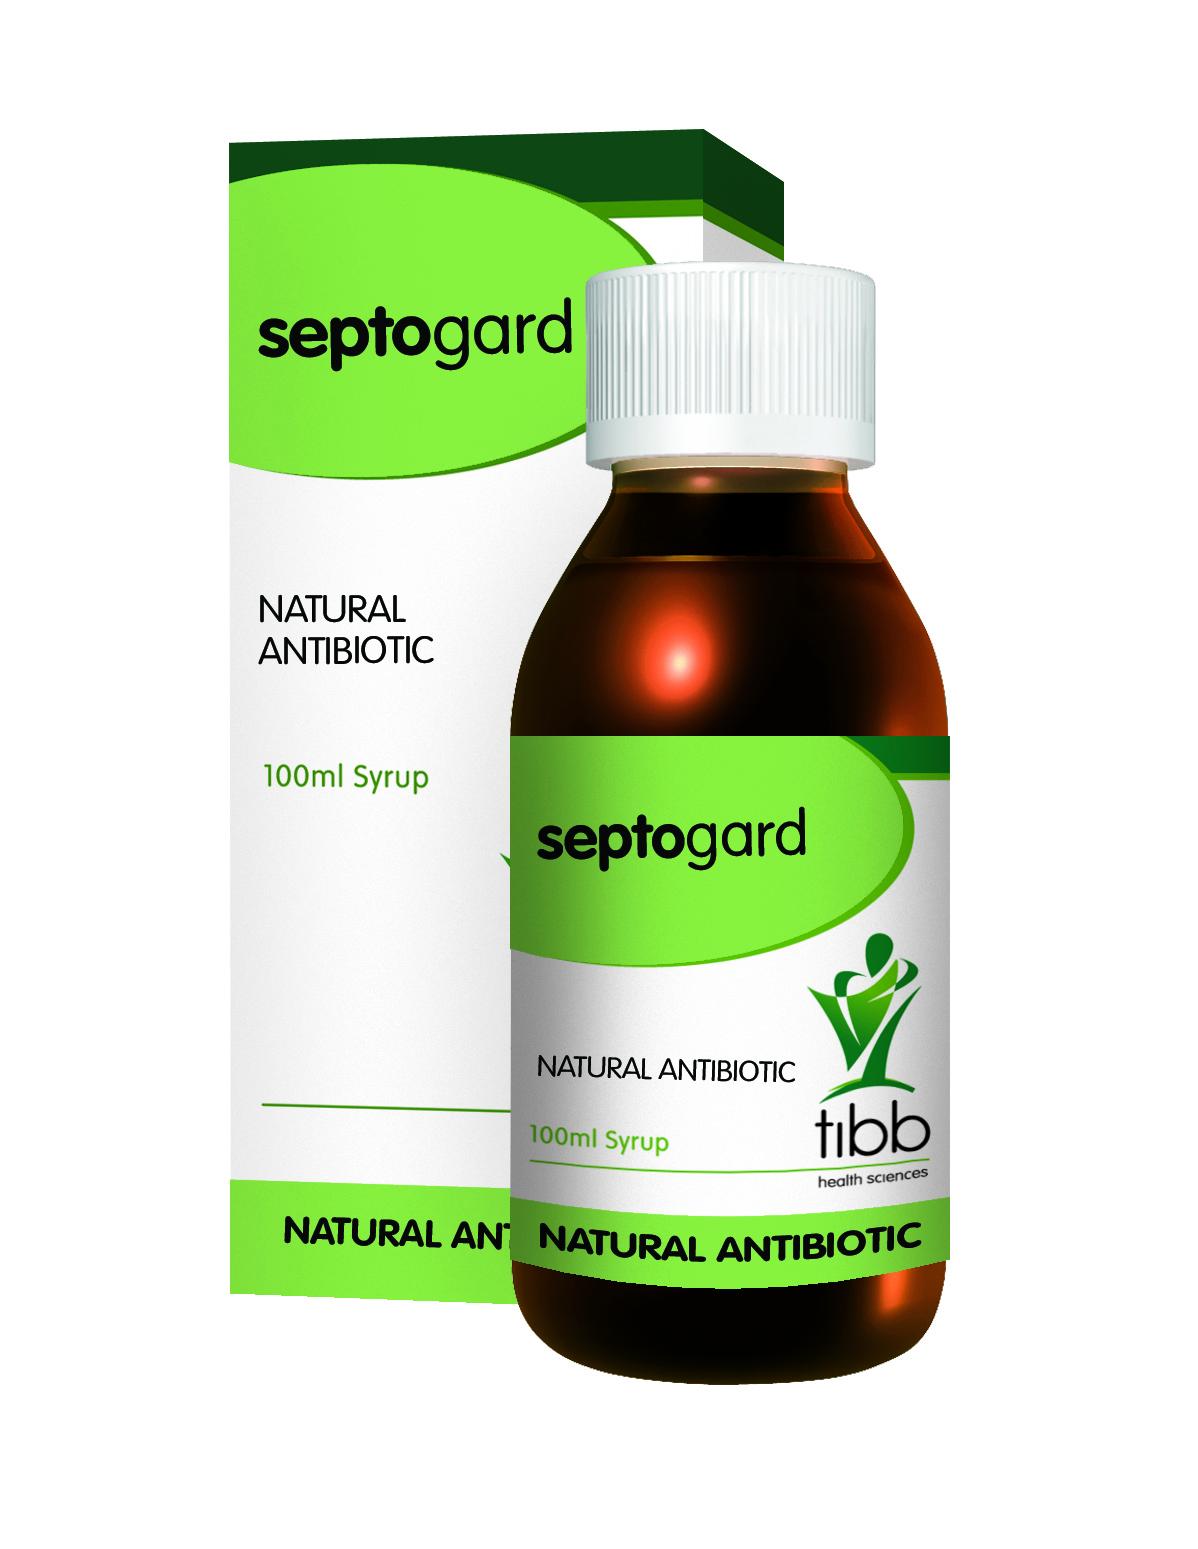 Tibb Septogard Syrup 100ml